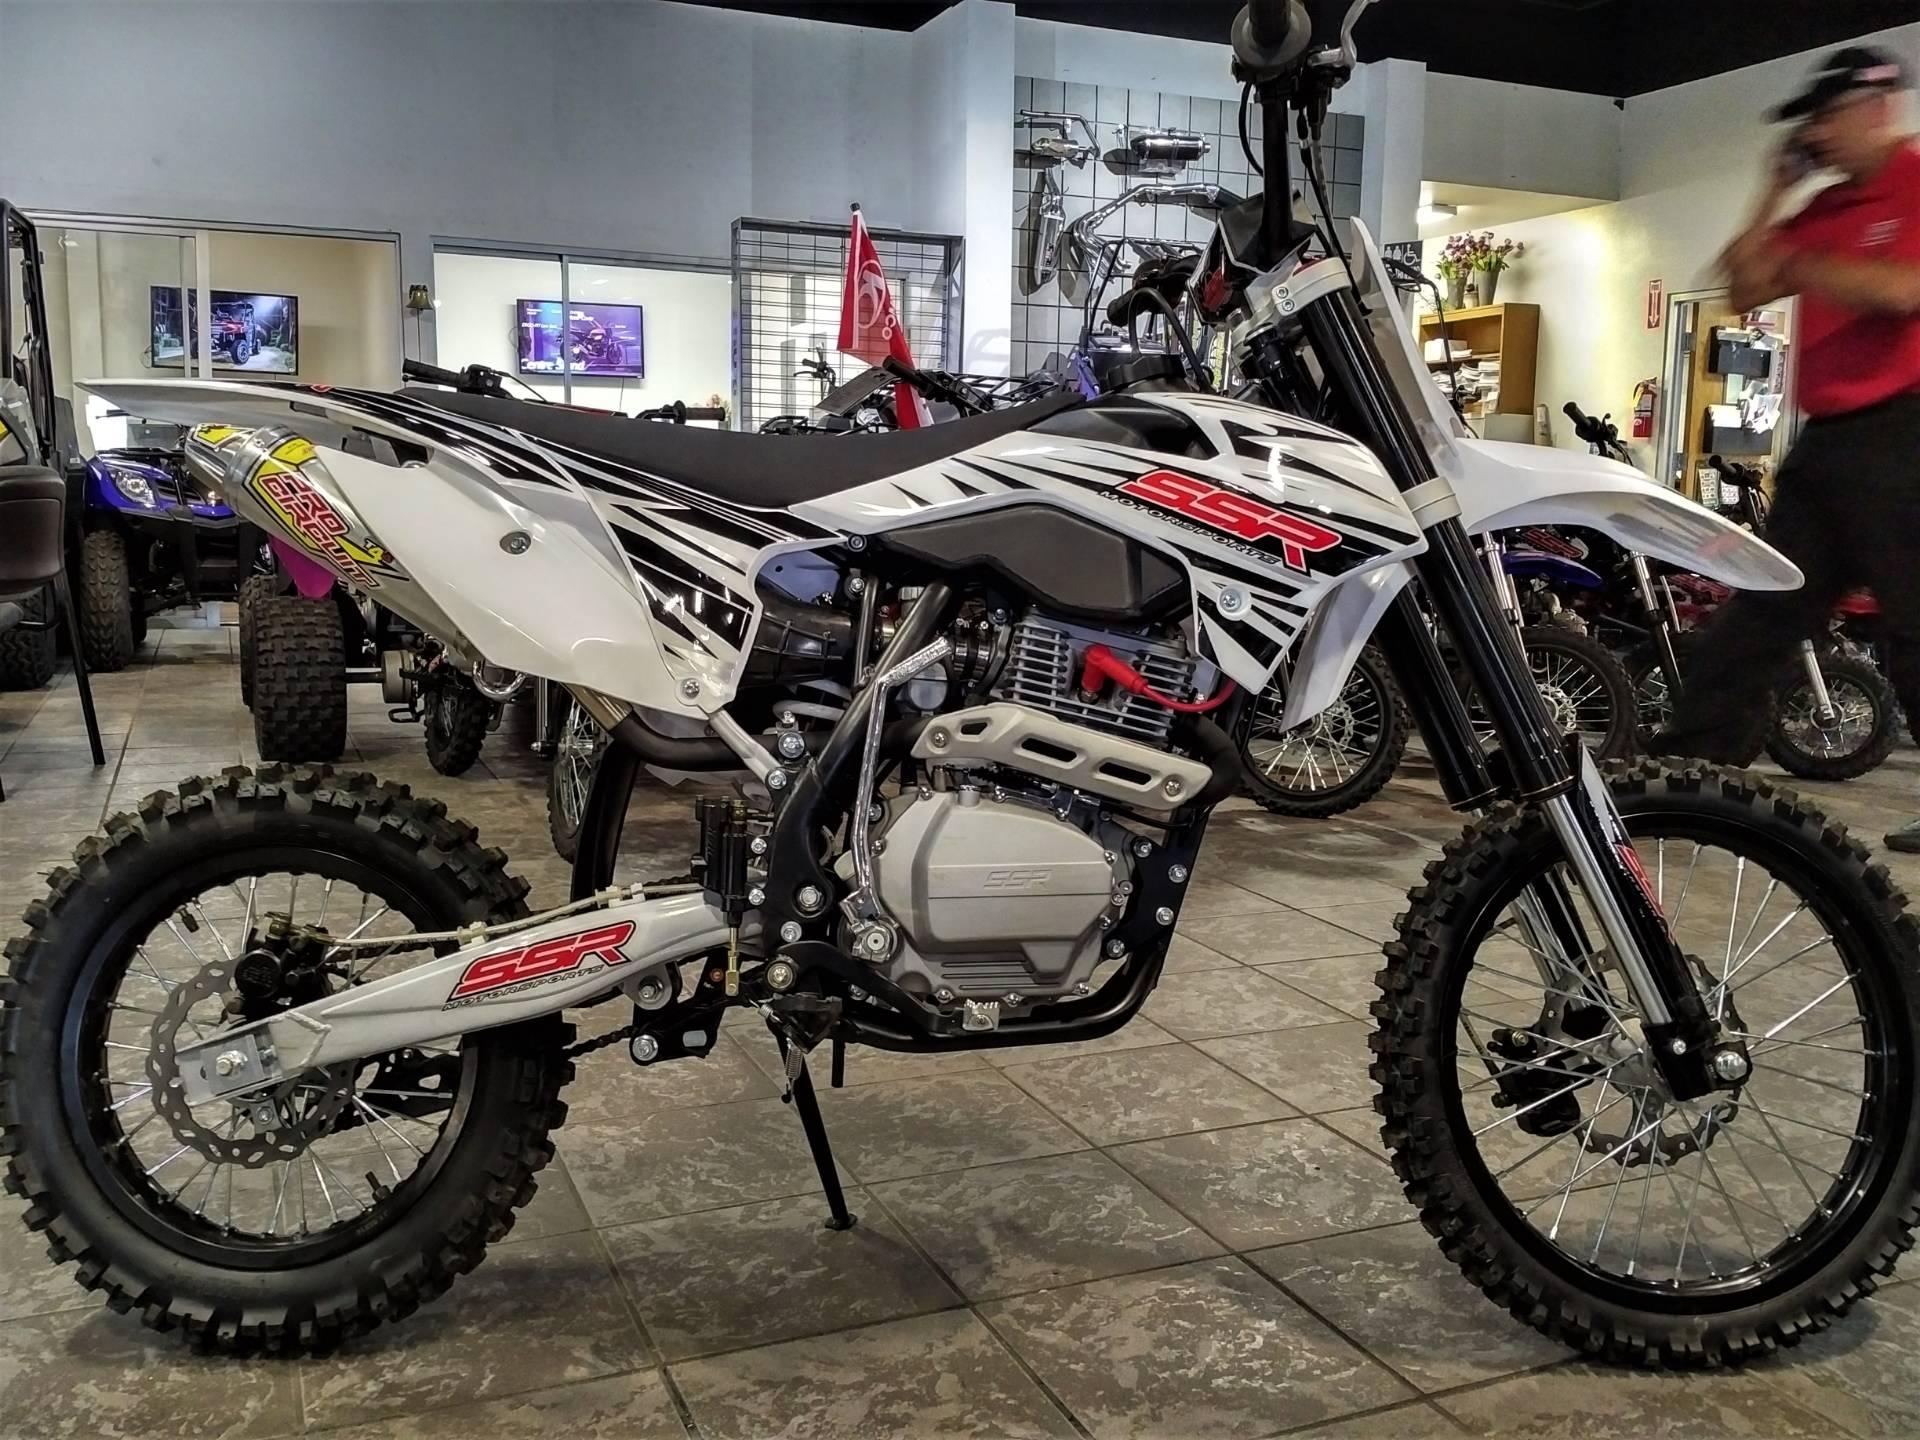 2018  SR150 for sale 10728